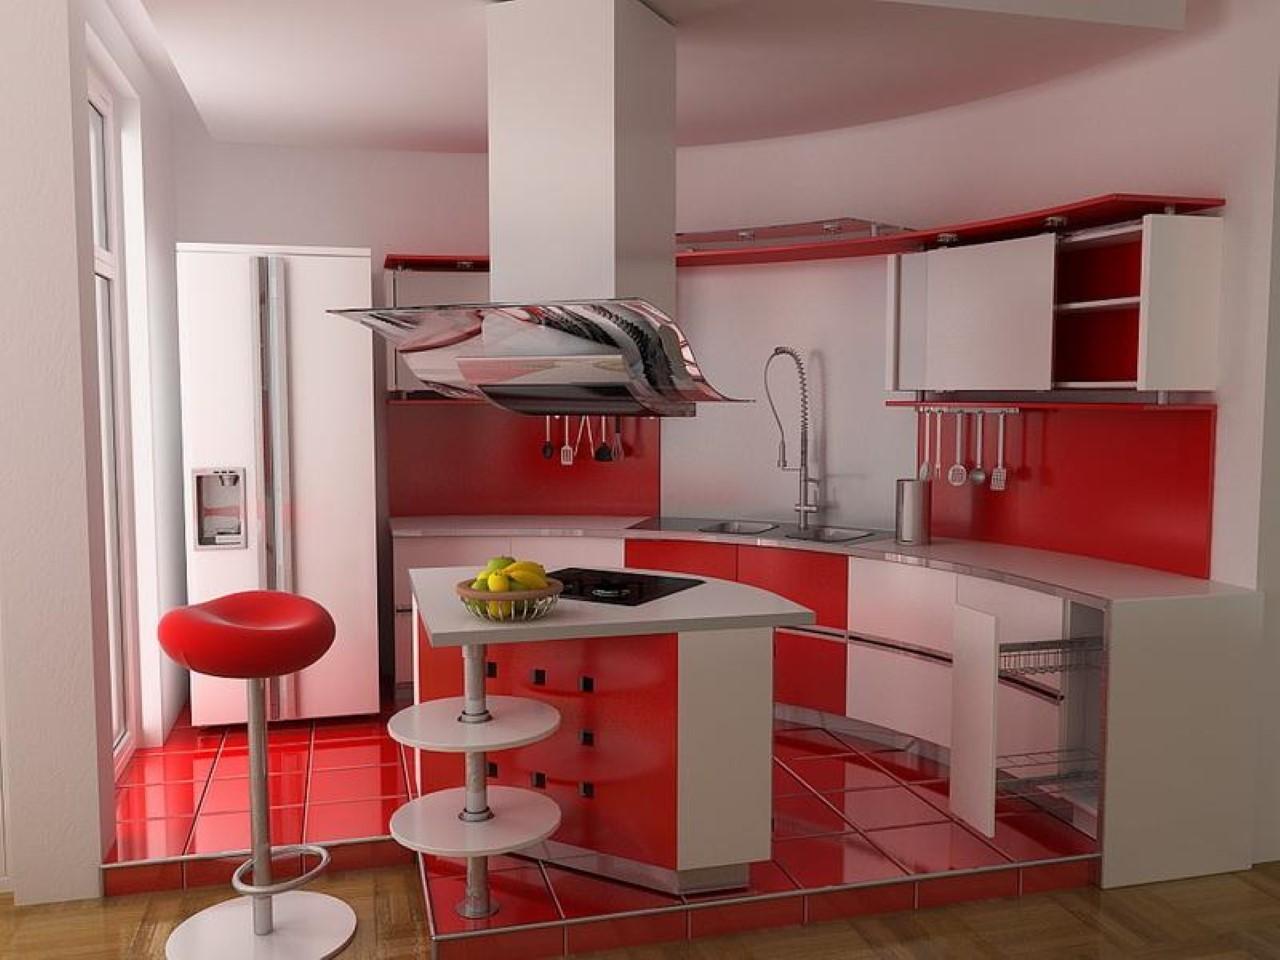 Бело красная кухня интерьер